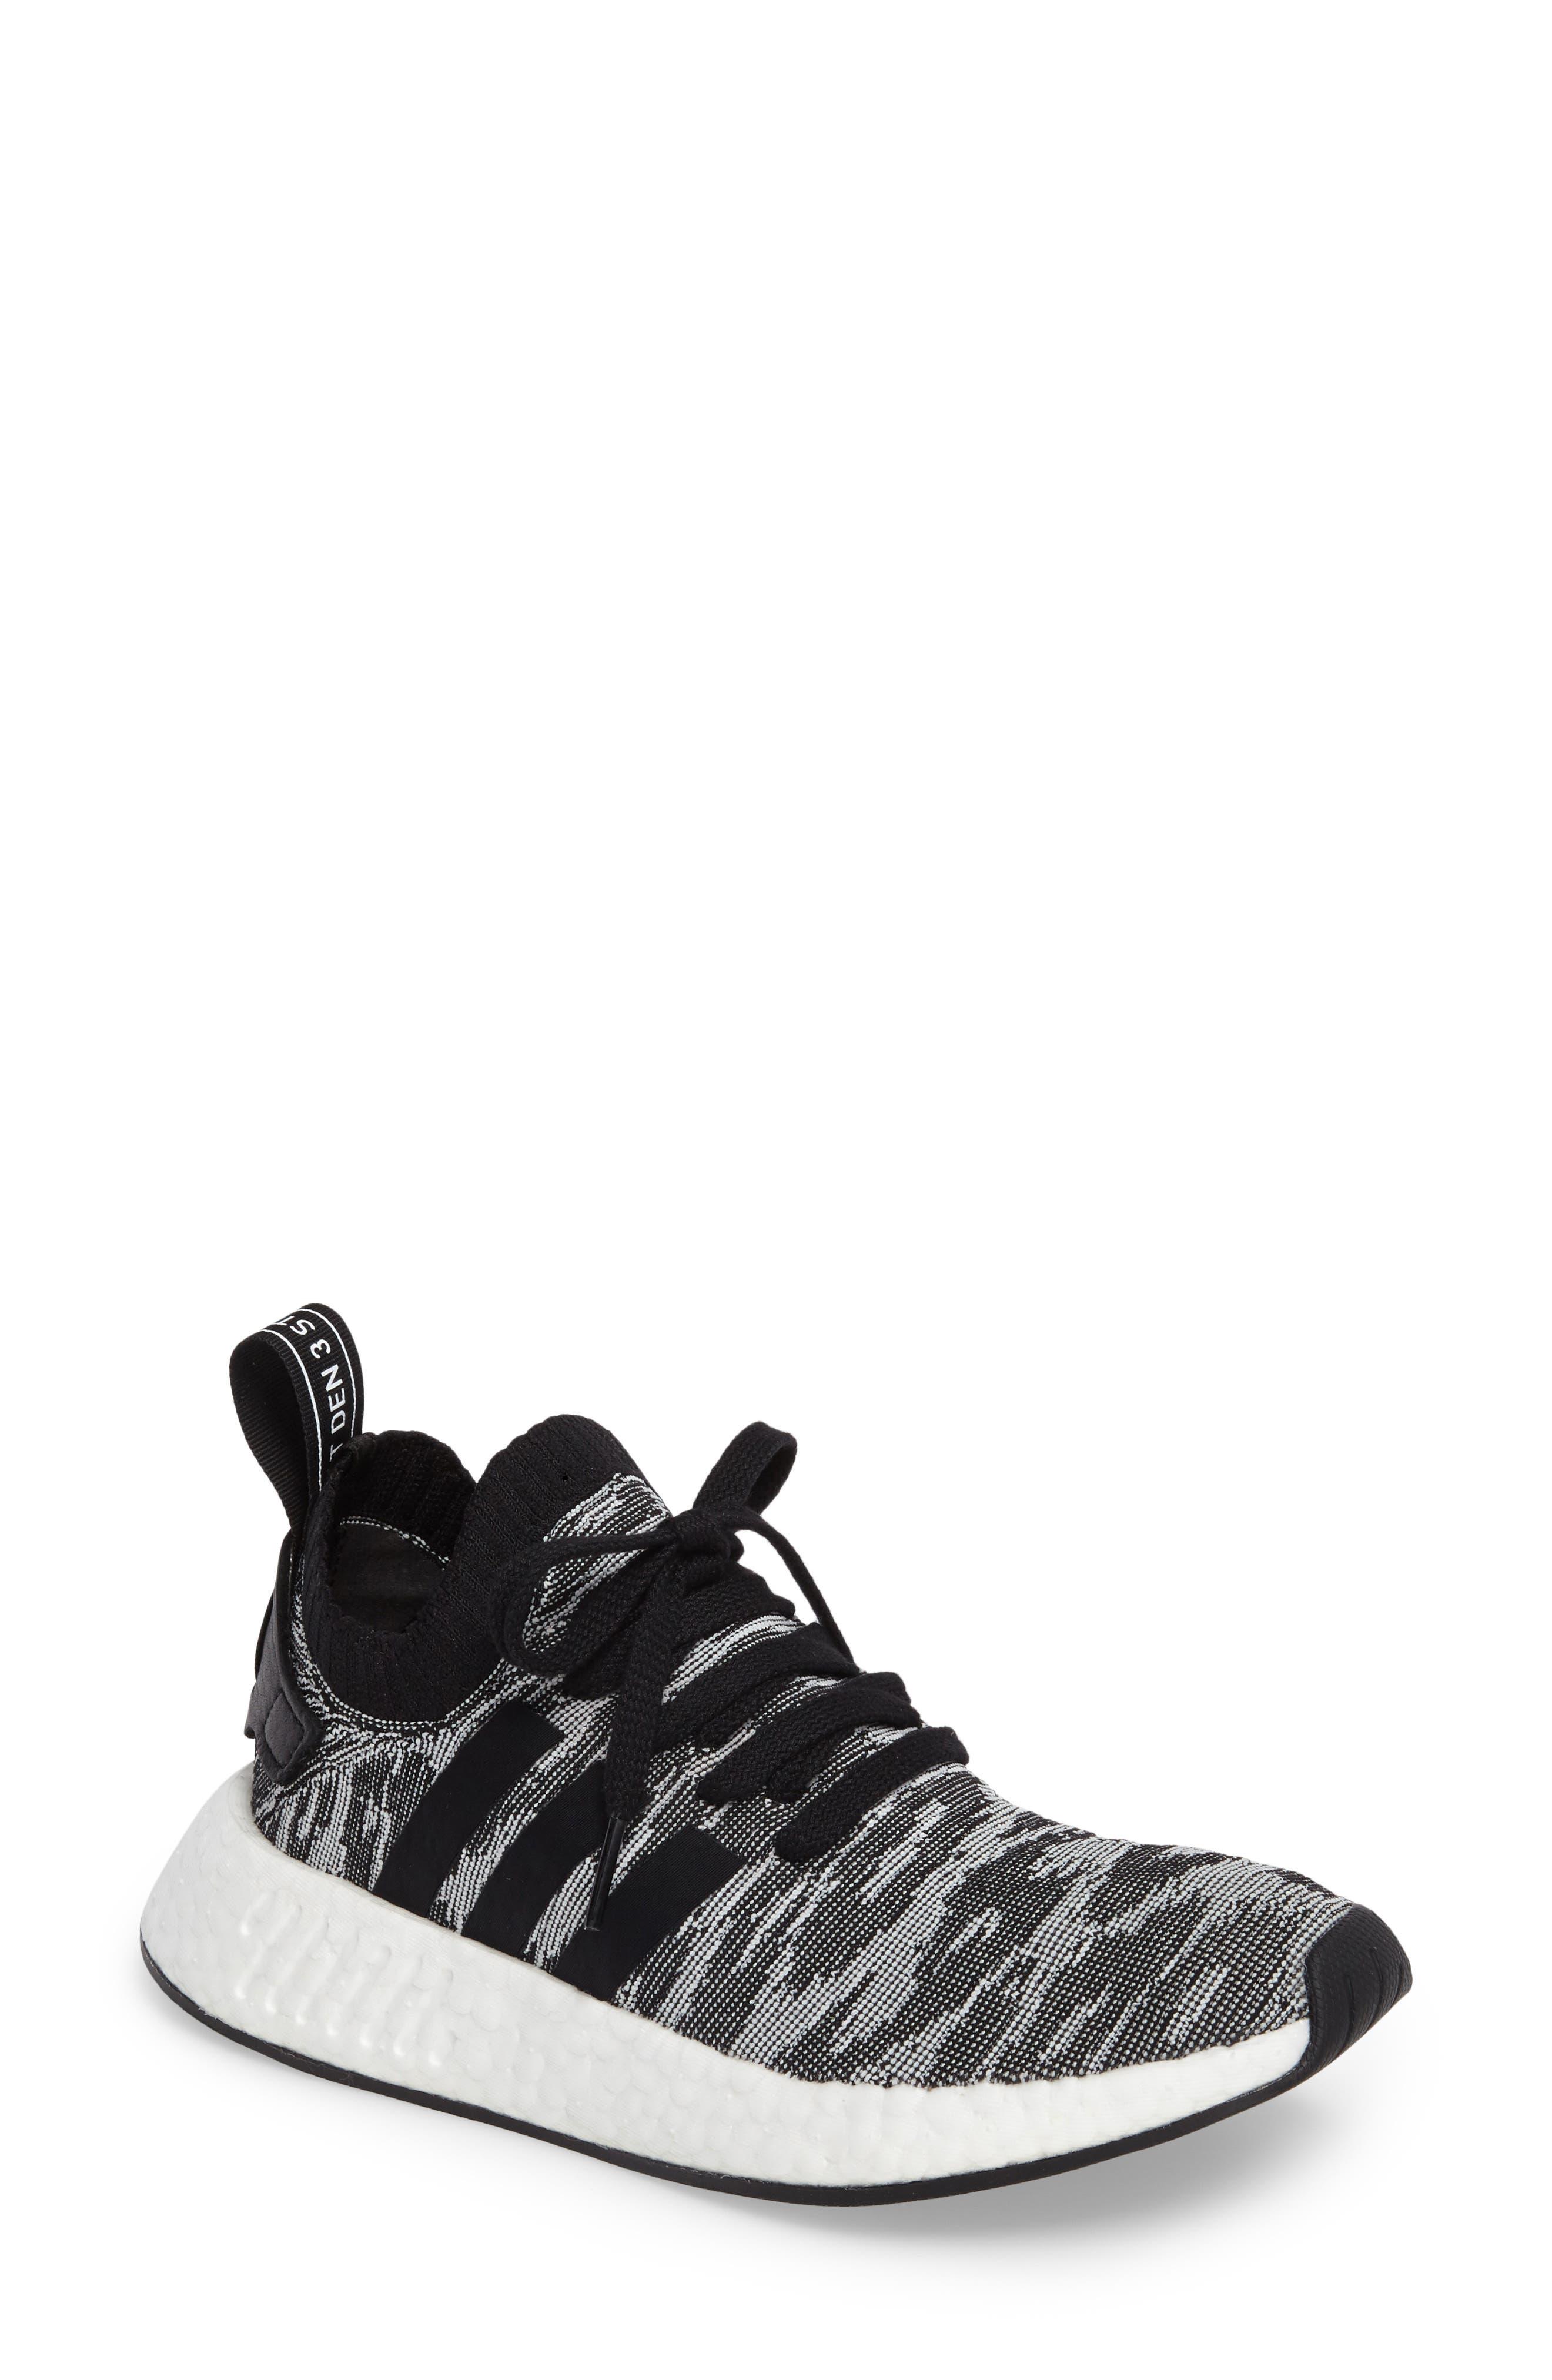 NMD R2 Primeknit Athletic Shoe,                             Main thumbnail 2, color,